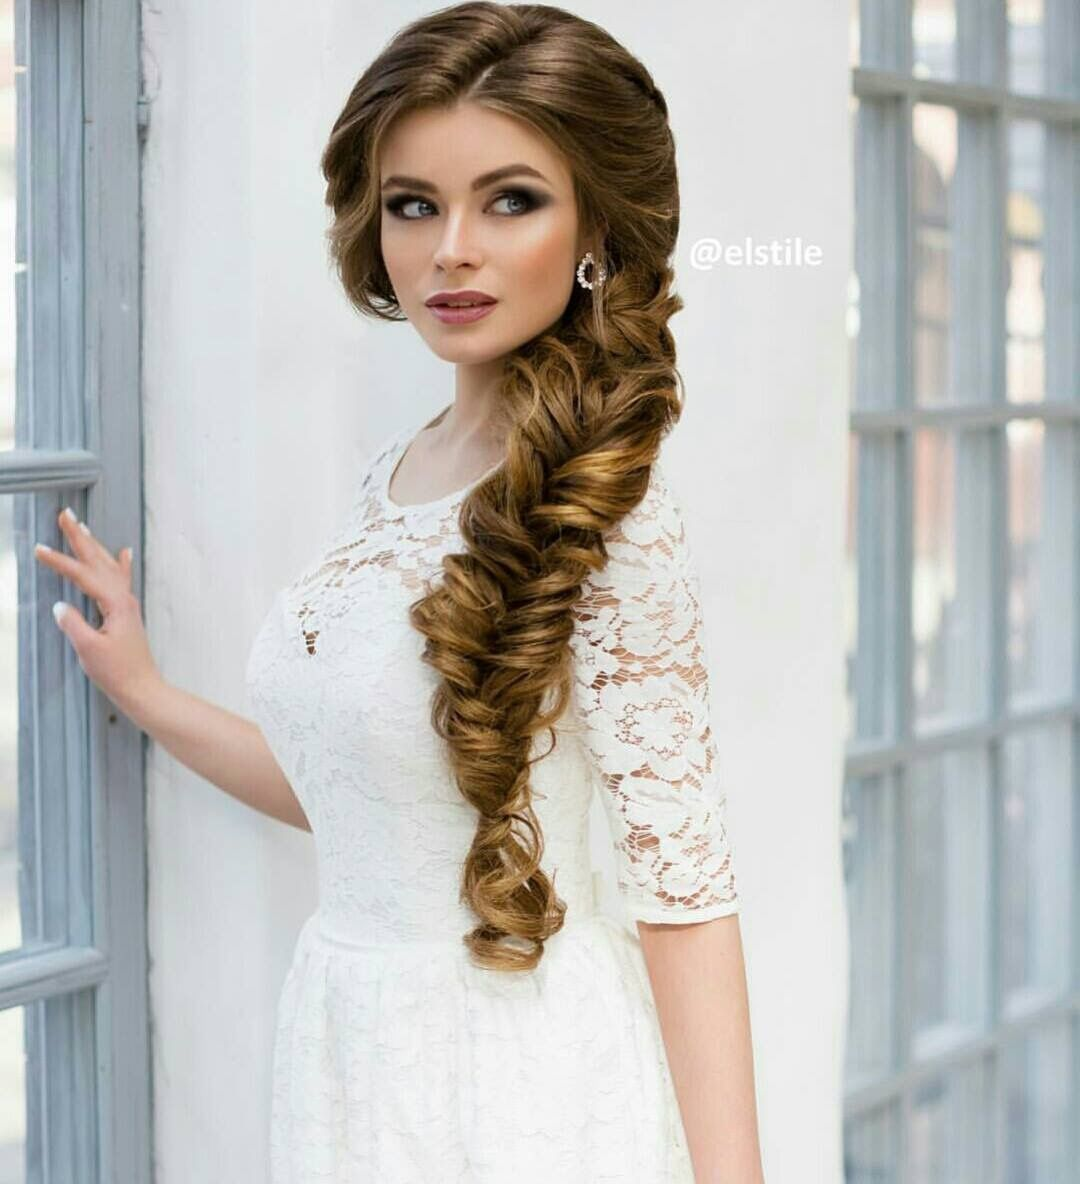 Pin by Kary RG on Peinados | Pinterest | Boho hairstyles, Formal ...